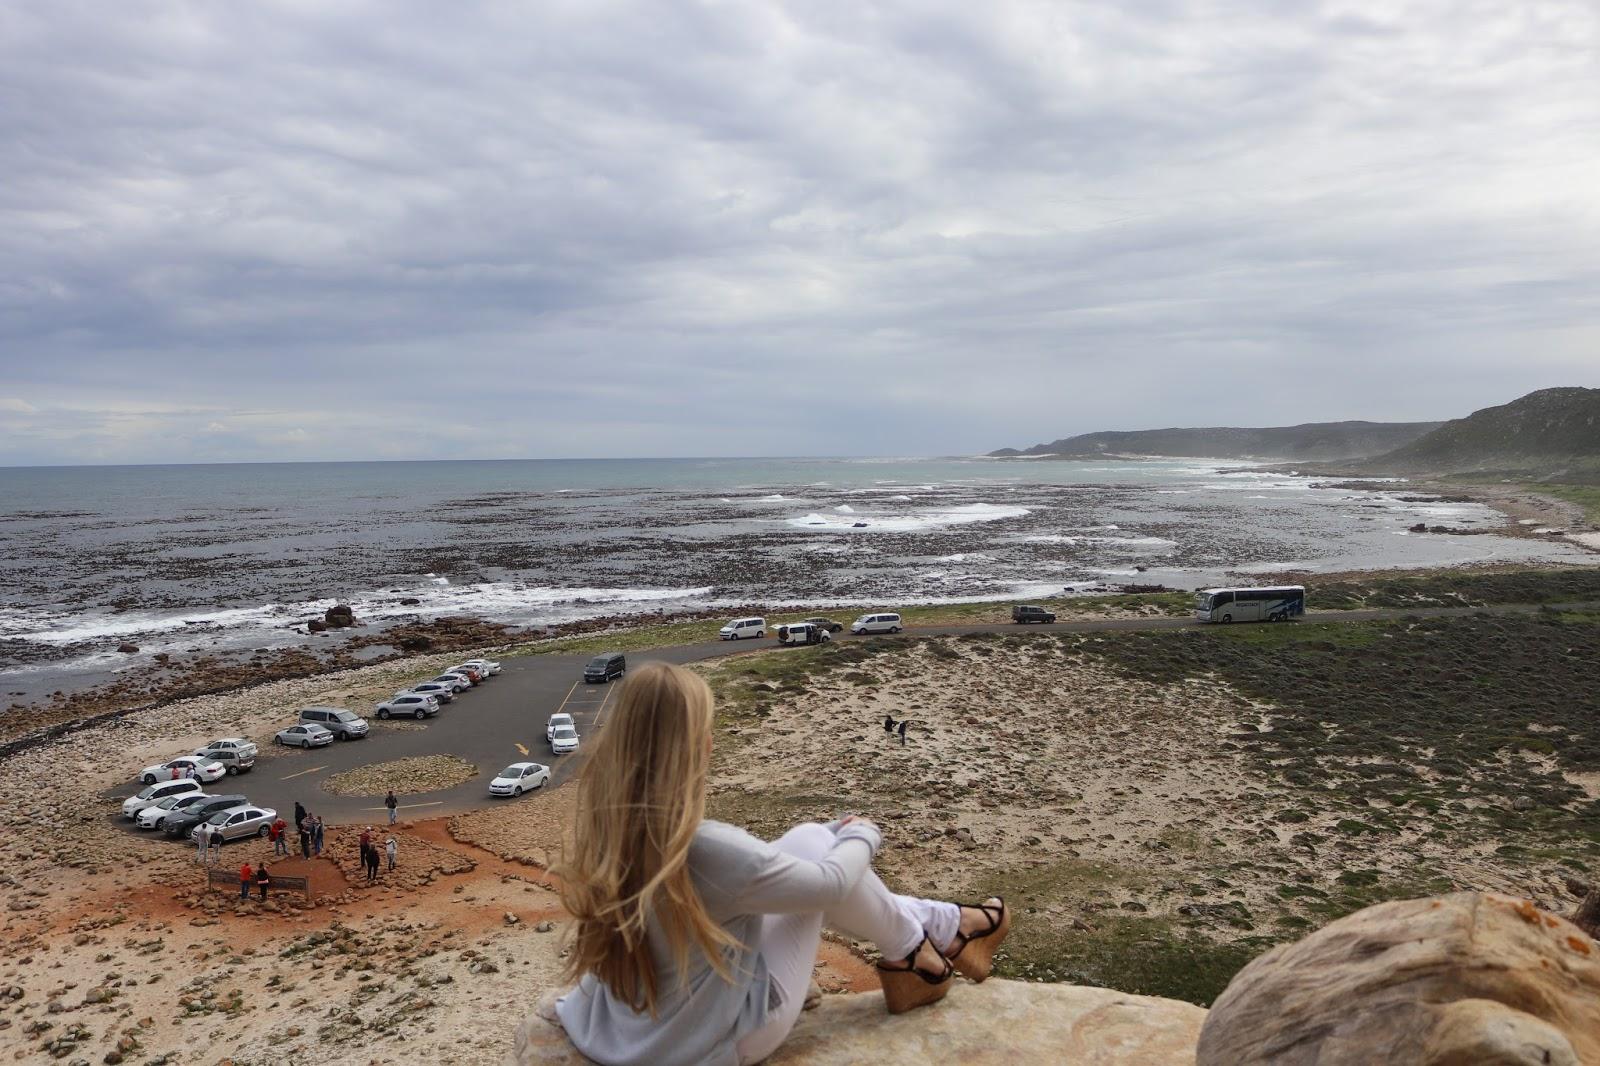 Cape of Good Hope Kalanchoe